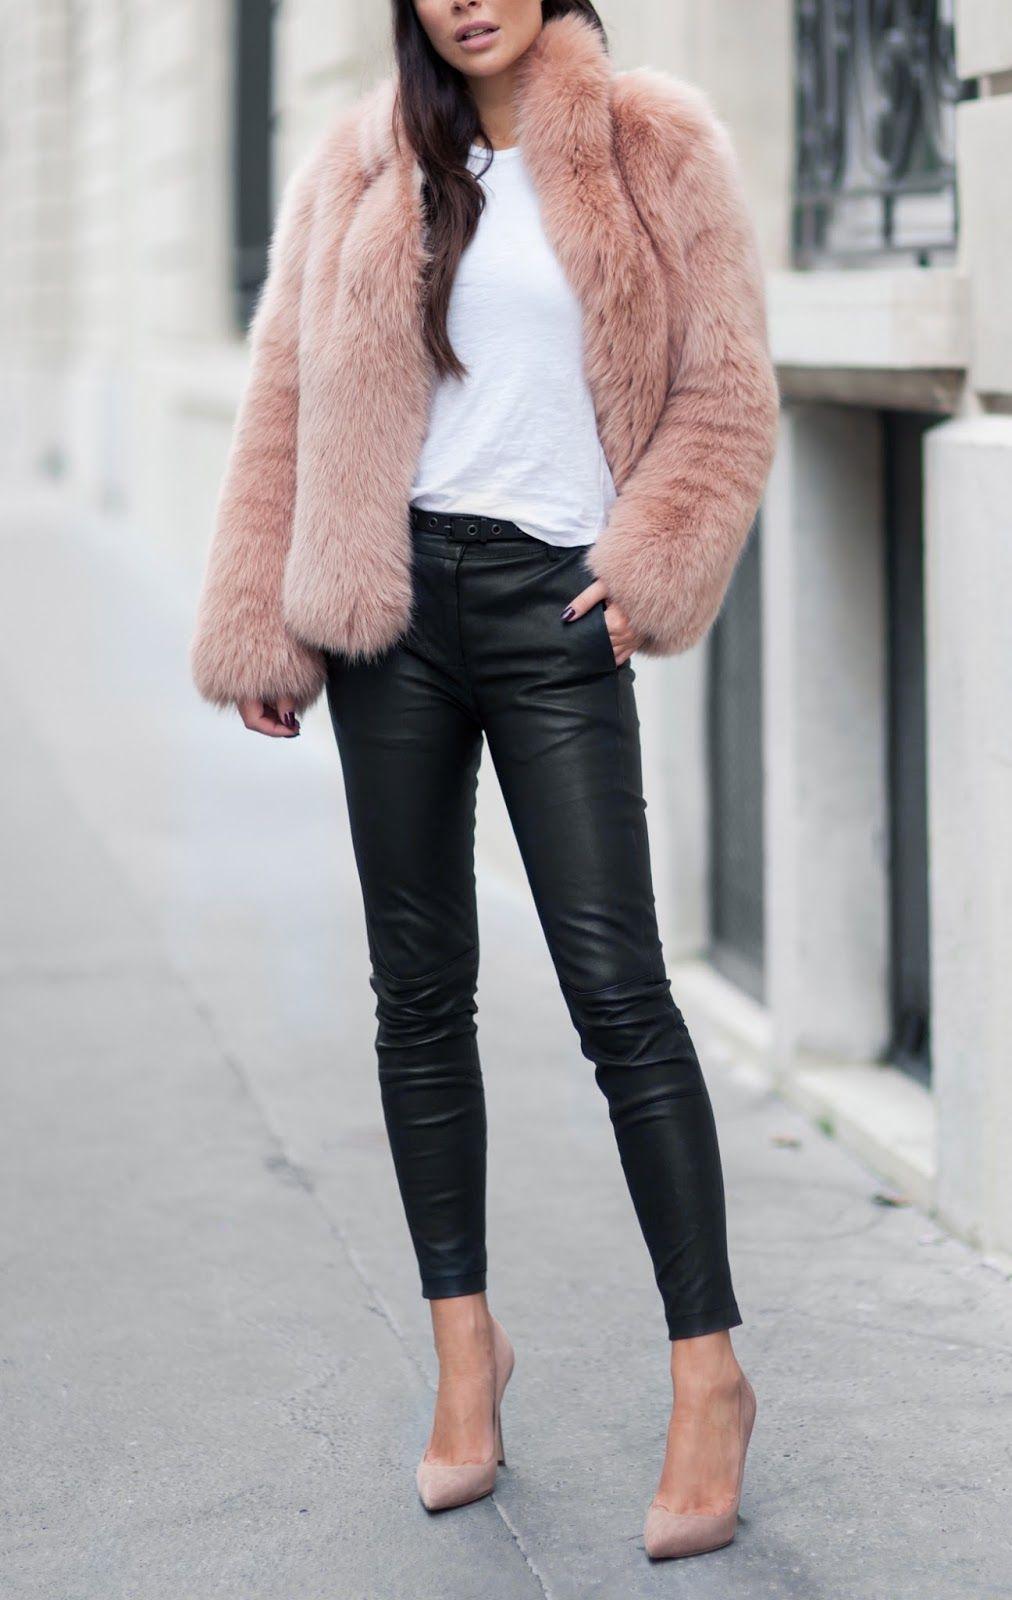 Blush faux fur coat, blush heels, black leather pants, white tee